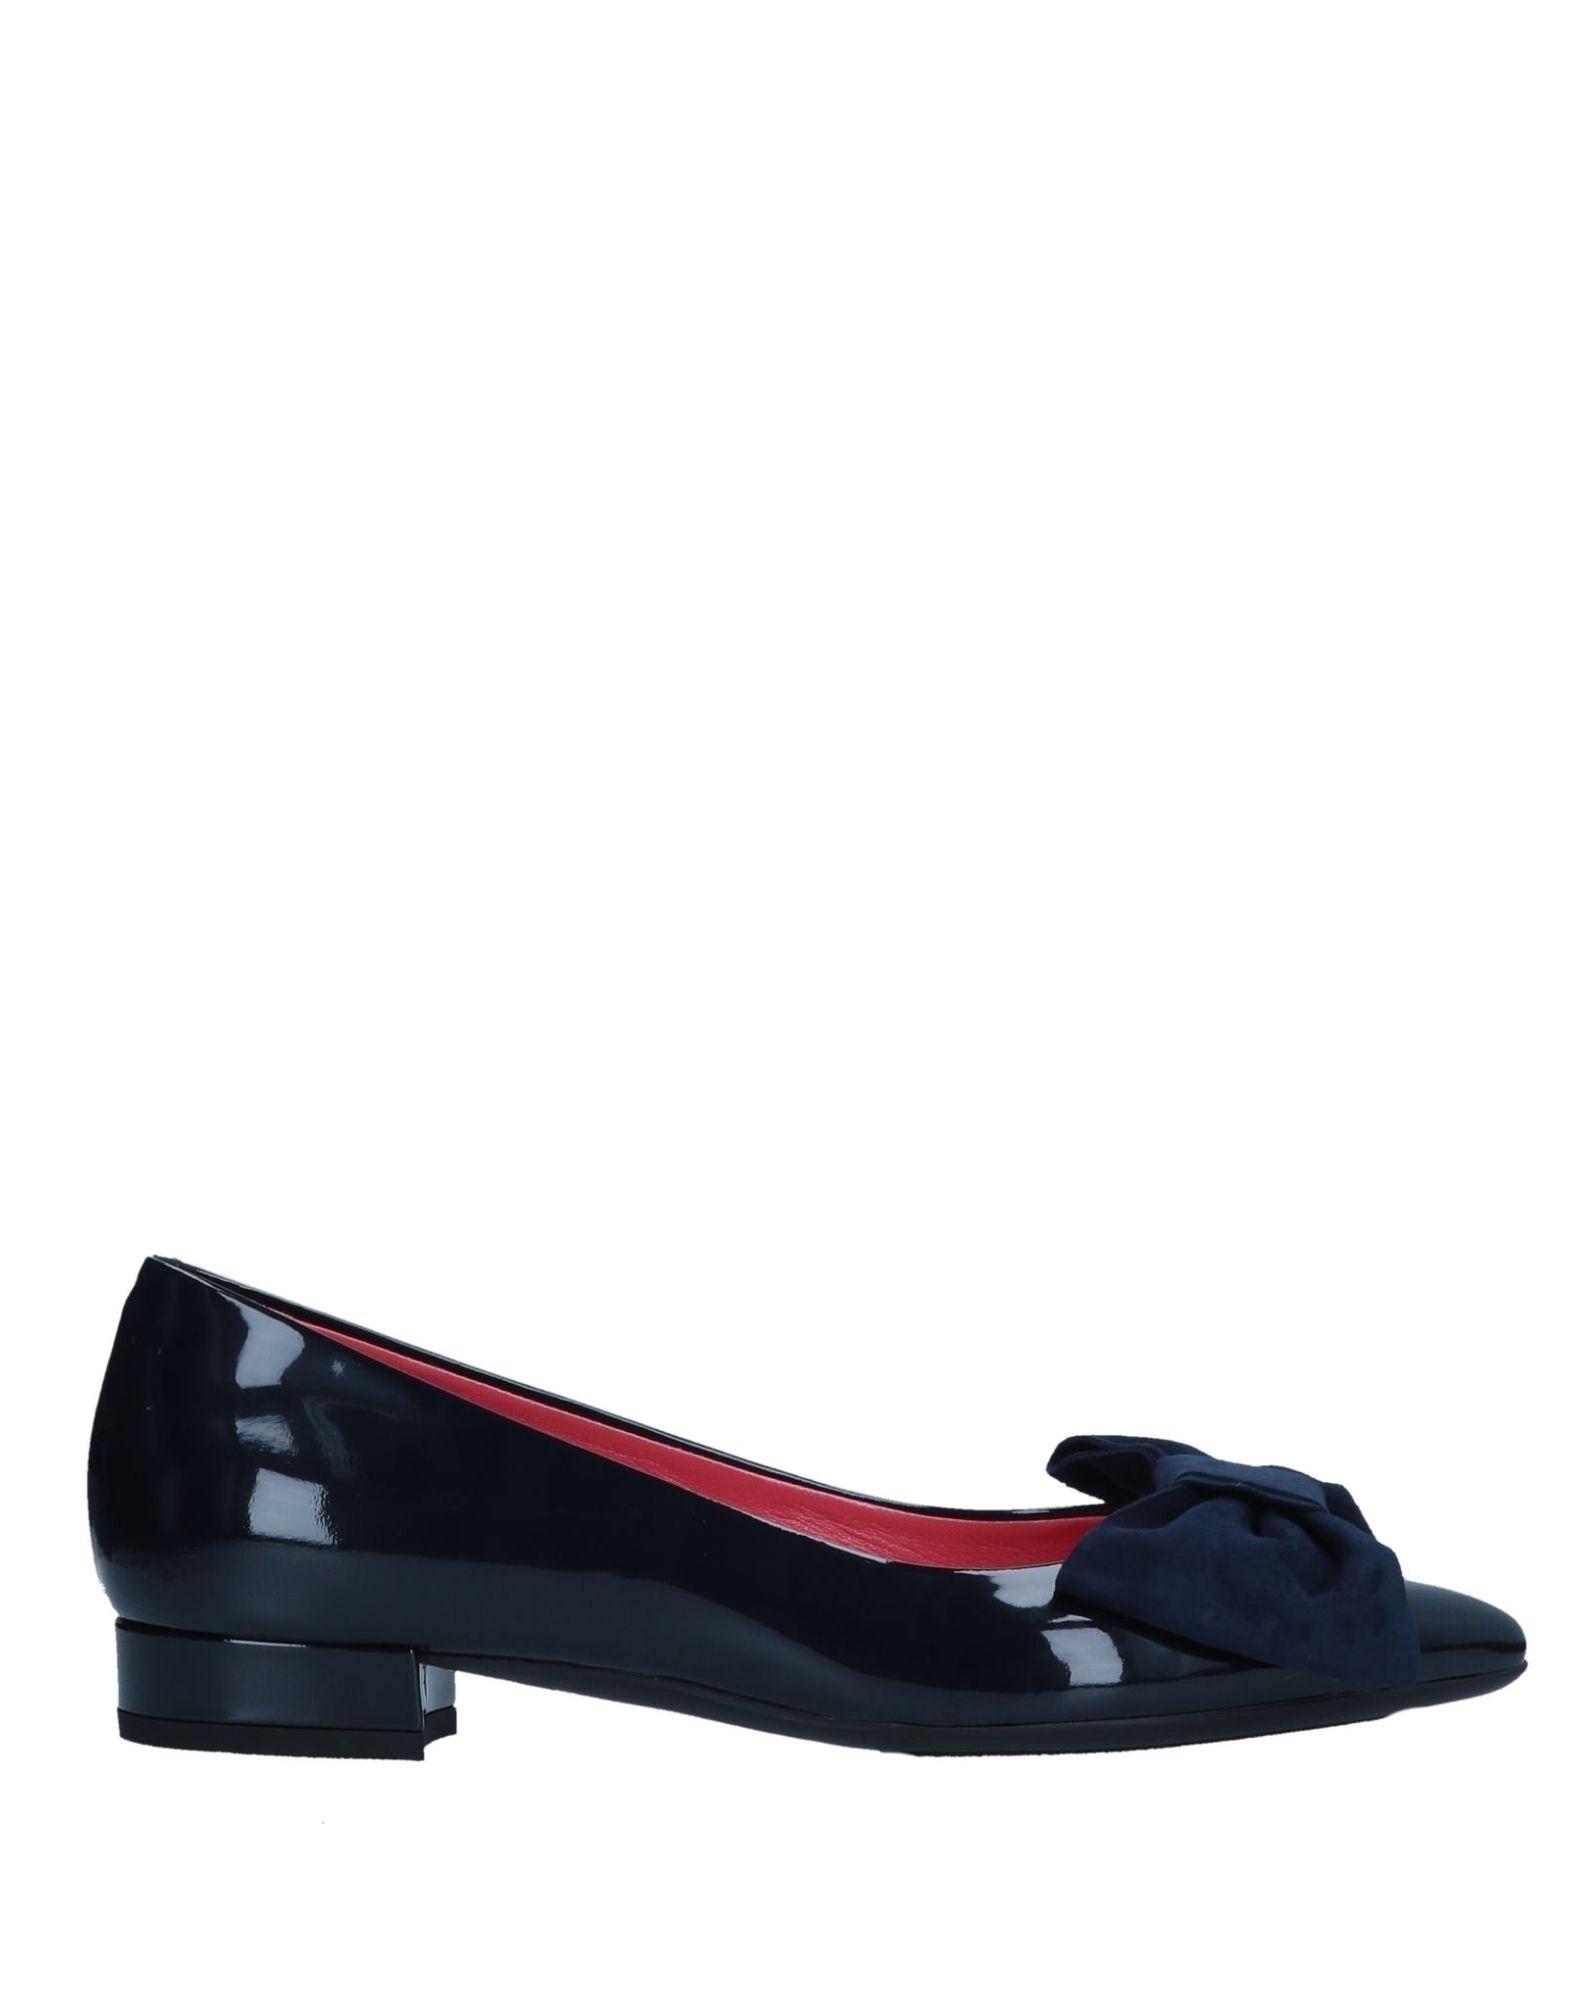 Stilvolle billige Schuhe Pas De Rouge Ballerinas Damen  11546091WW